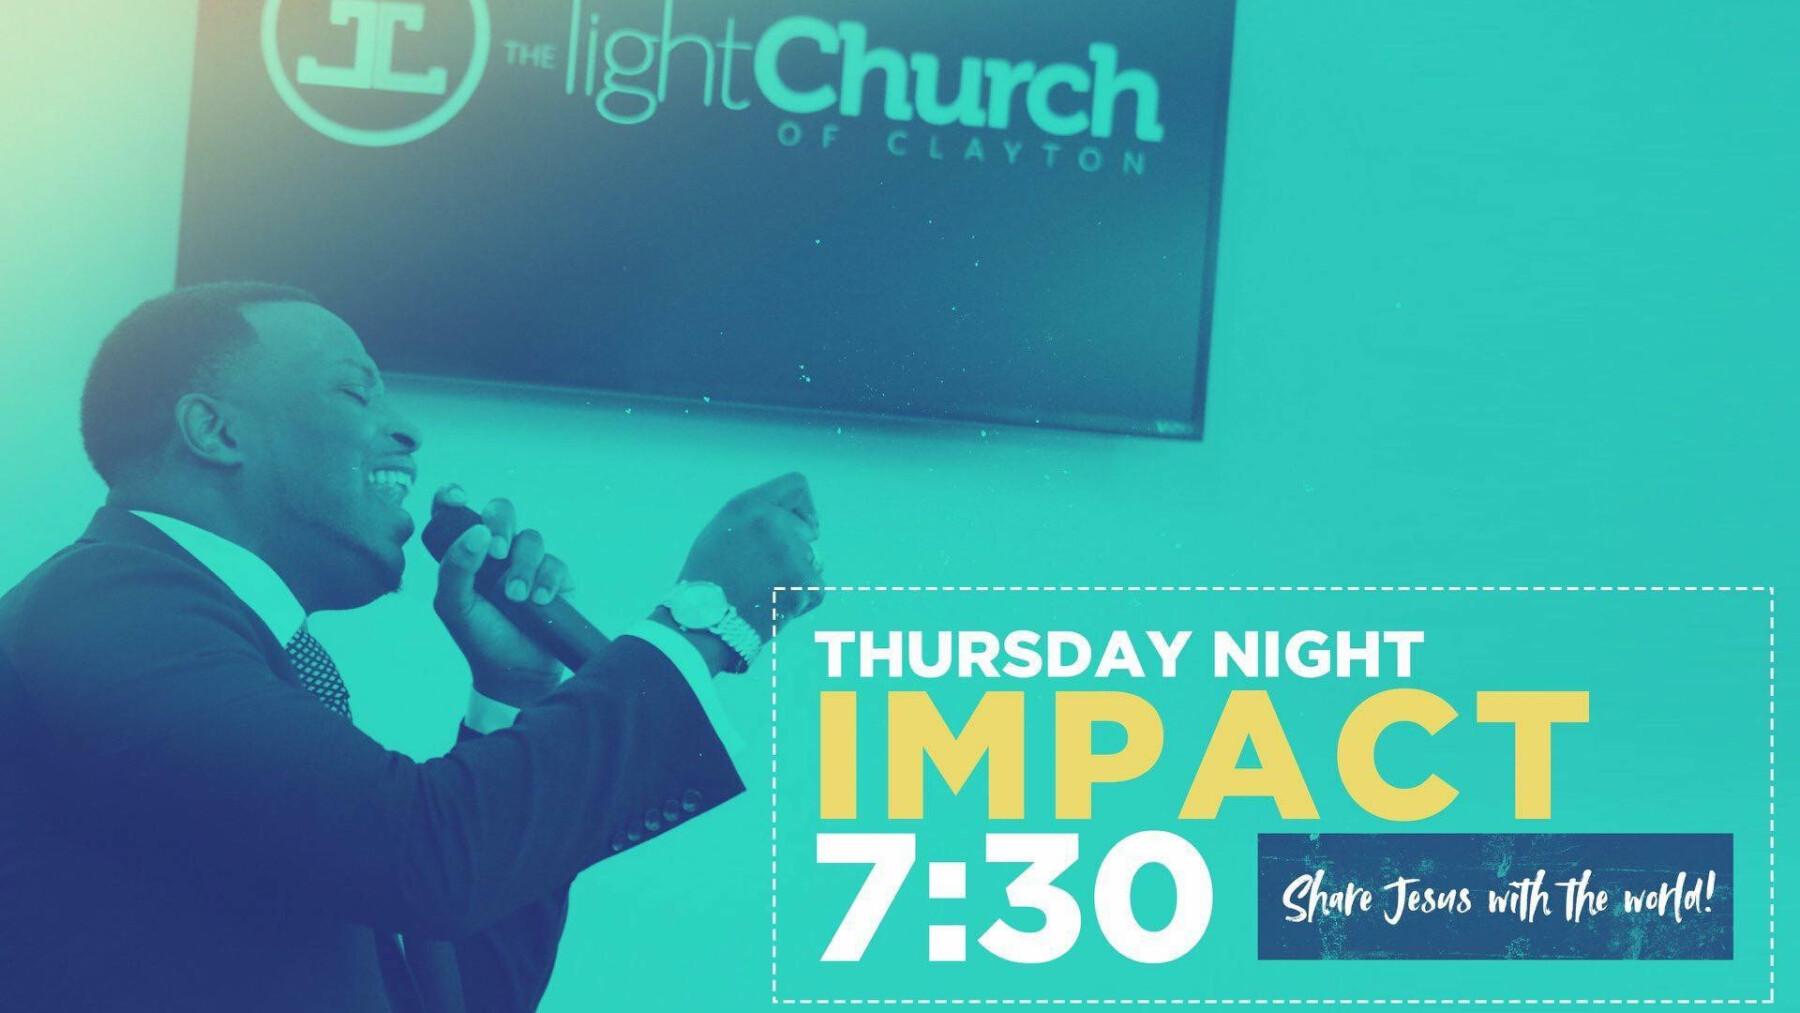 Impact @ The Light